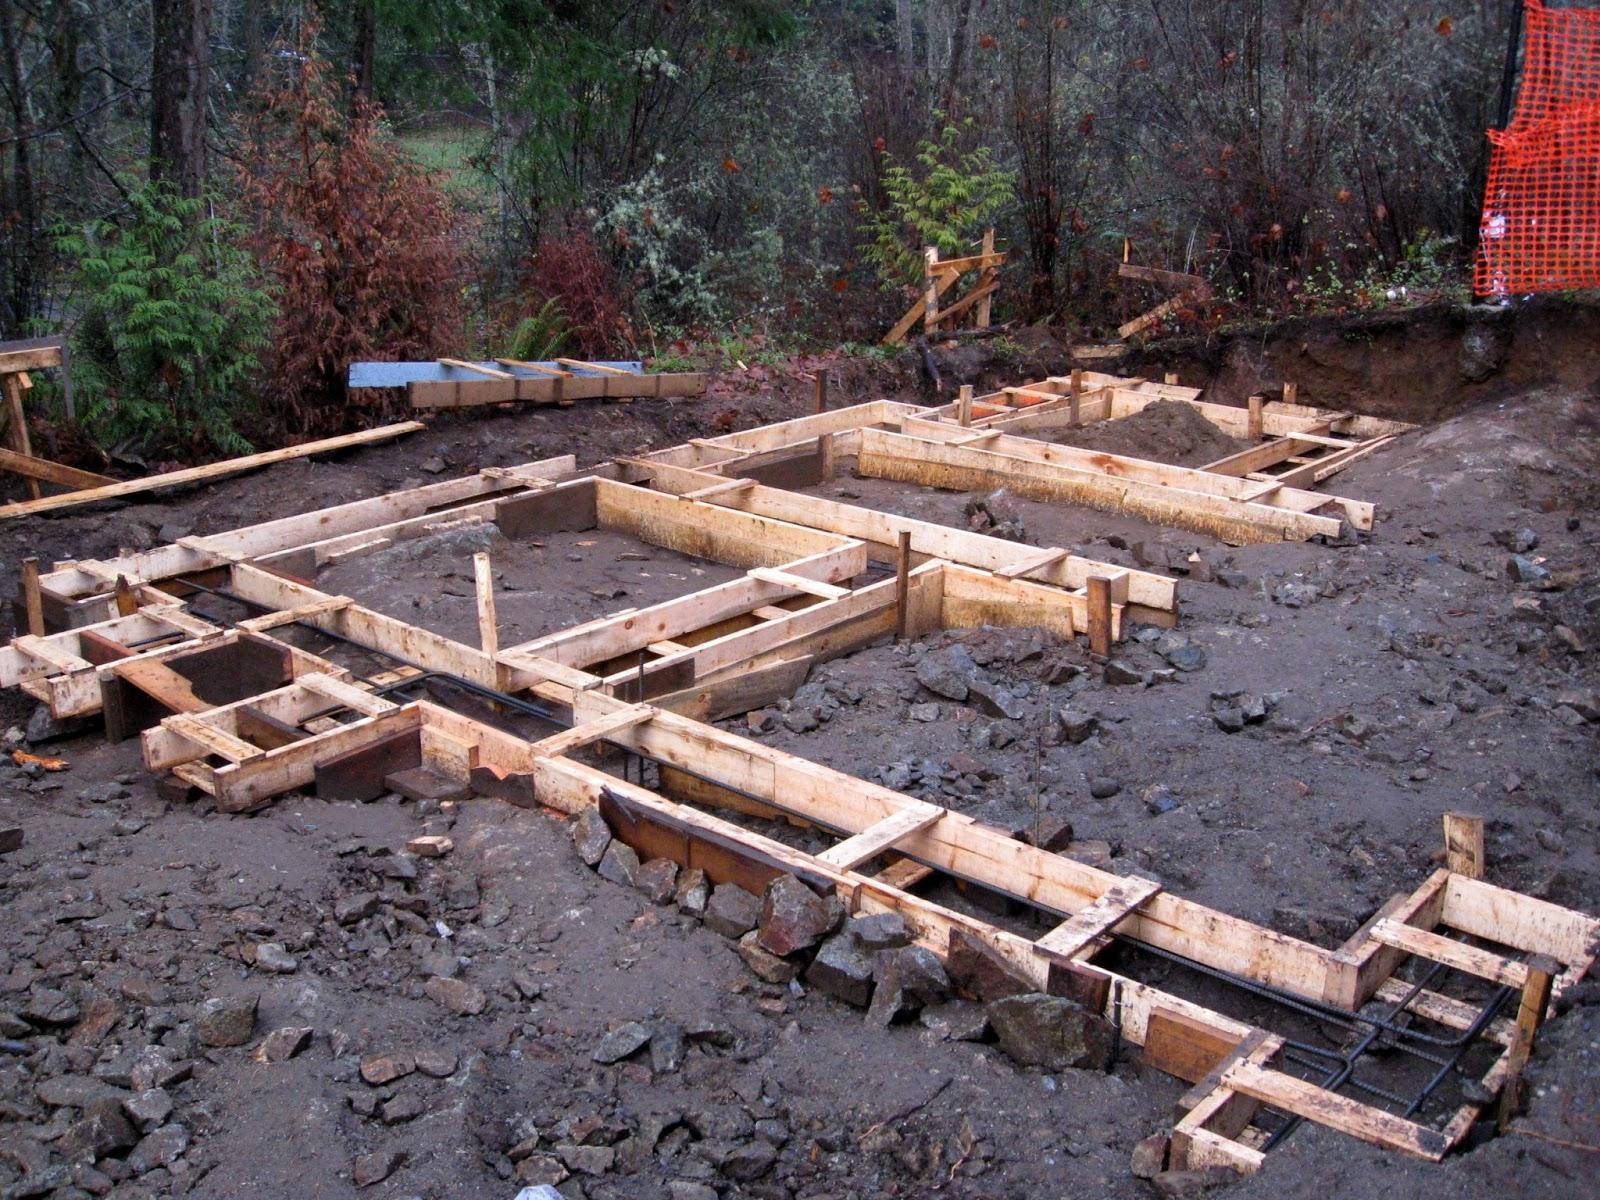 lesley turner backyard project 2 garden sheds u0027 foundations take